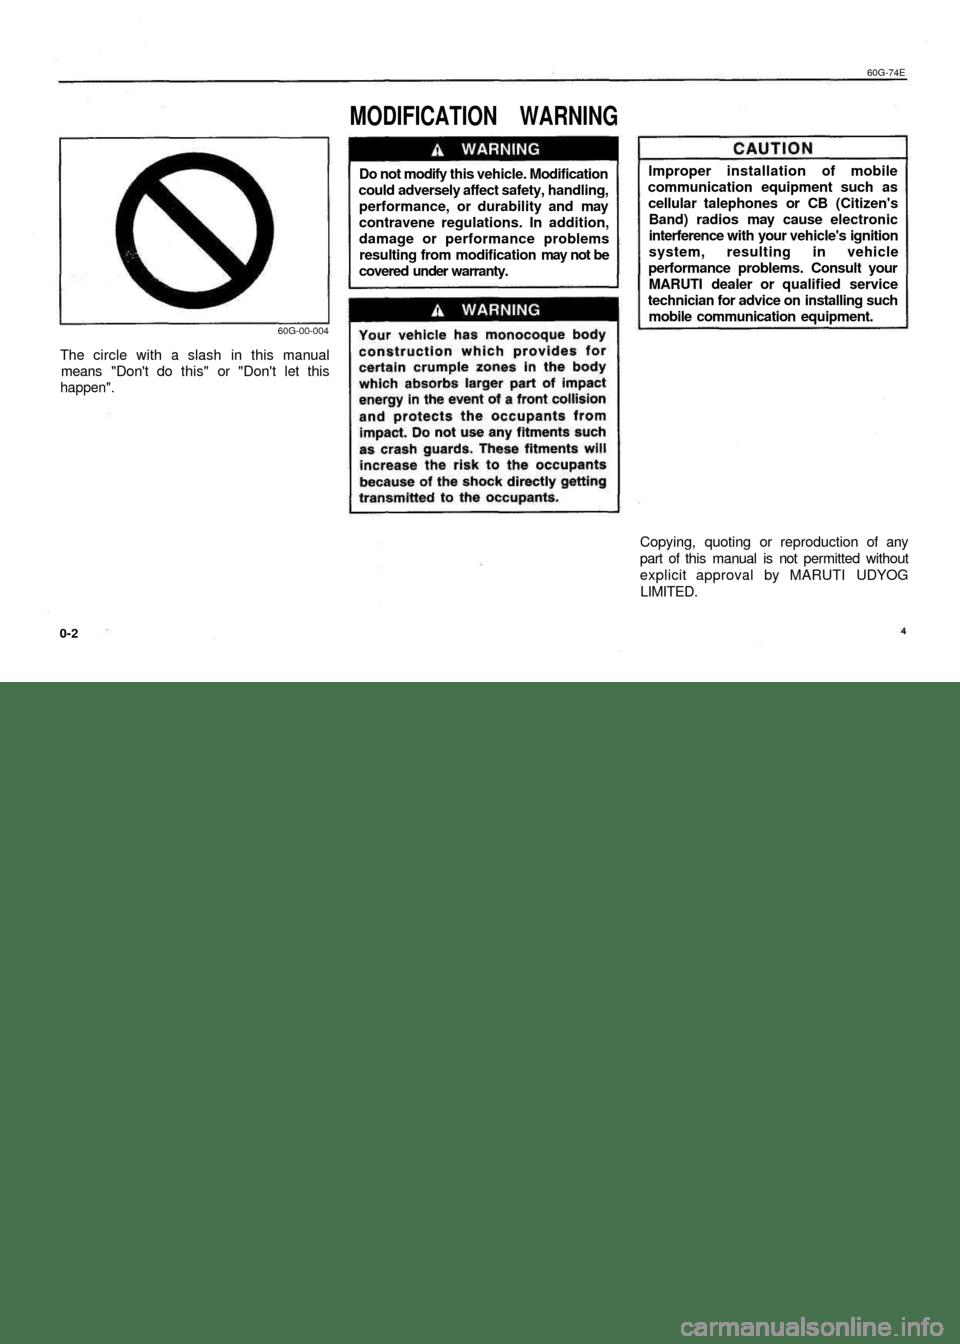 SUZUKI BALENO 1999 1.G Repair Manual (65 Pages)